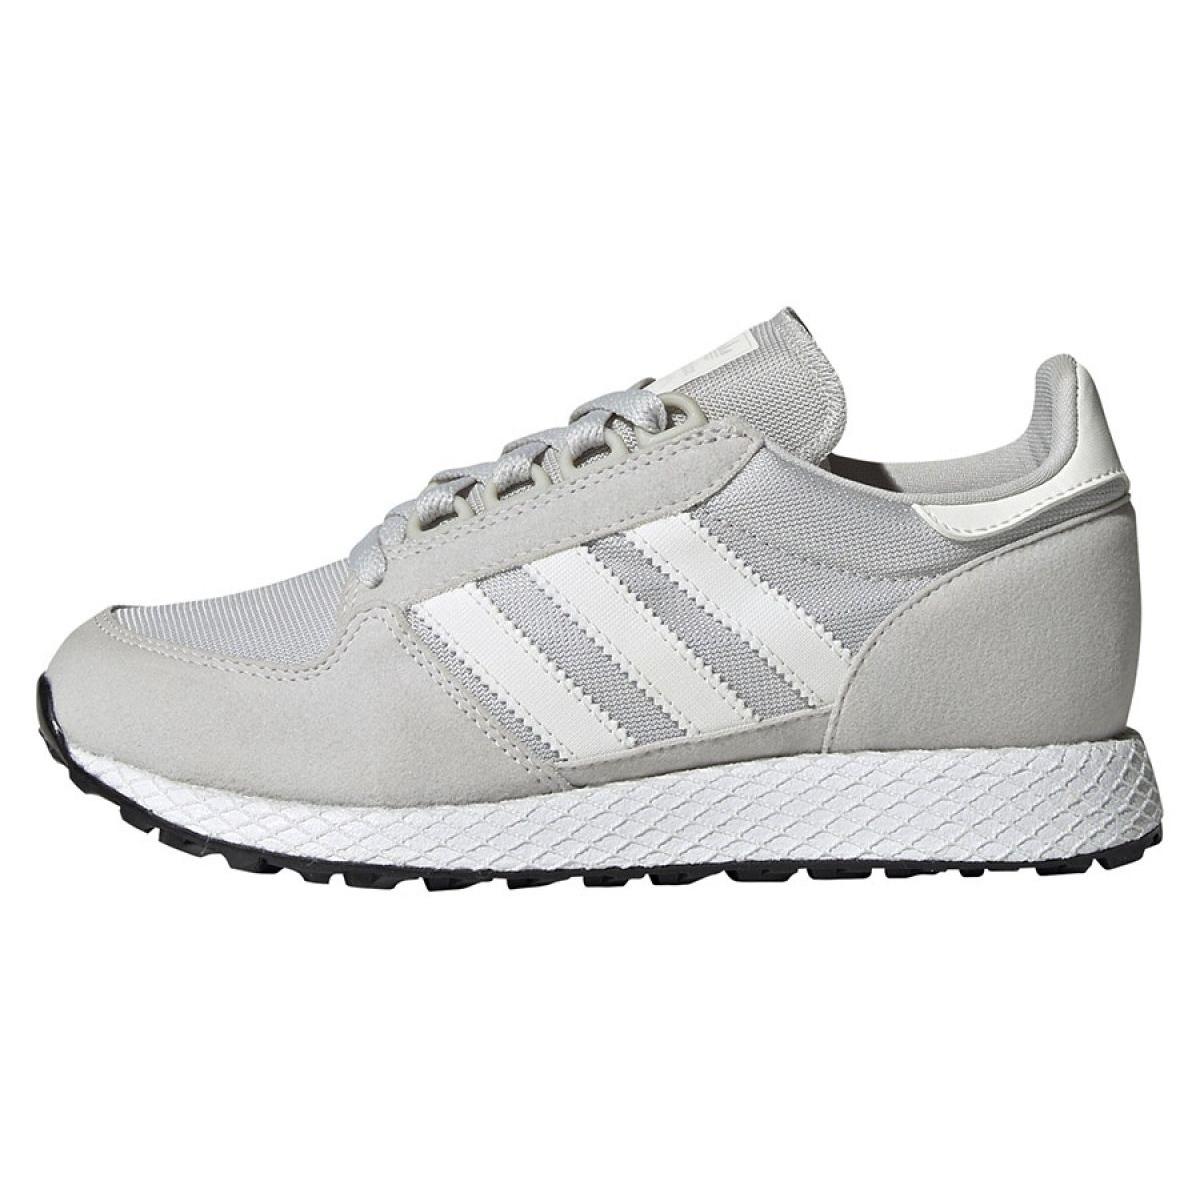 Adidas Originals Forest Grove Jr EE6565 cipő szürke